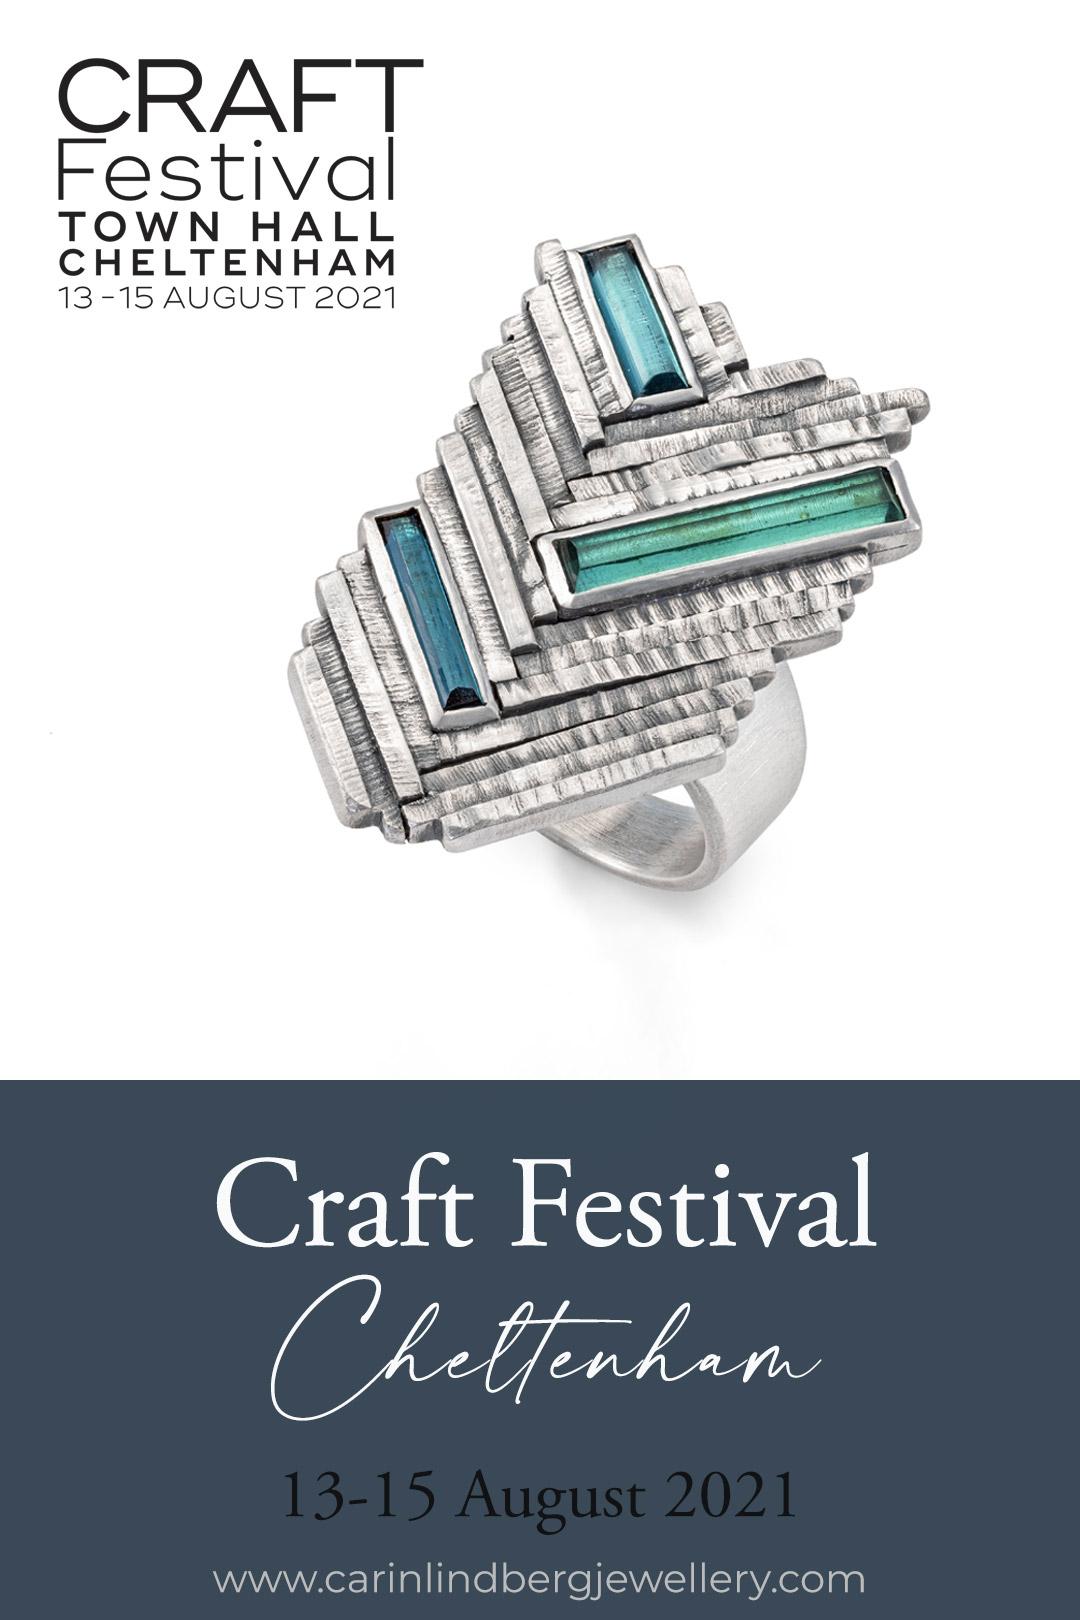 Carin Lindberg Jewellery exhibiting at Craft Festival Cheltenham 13-15 August 2021